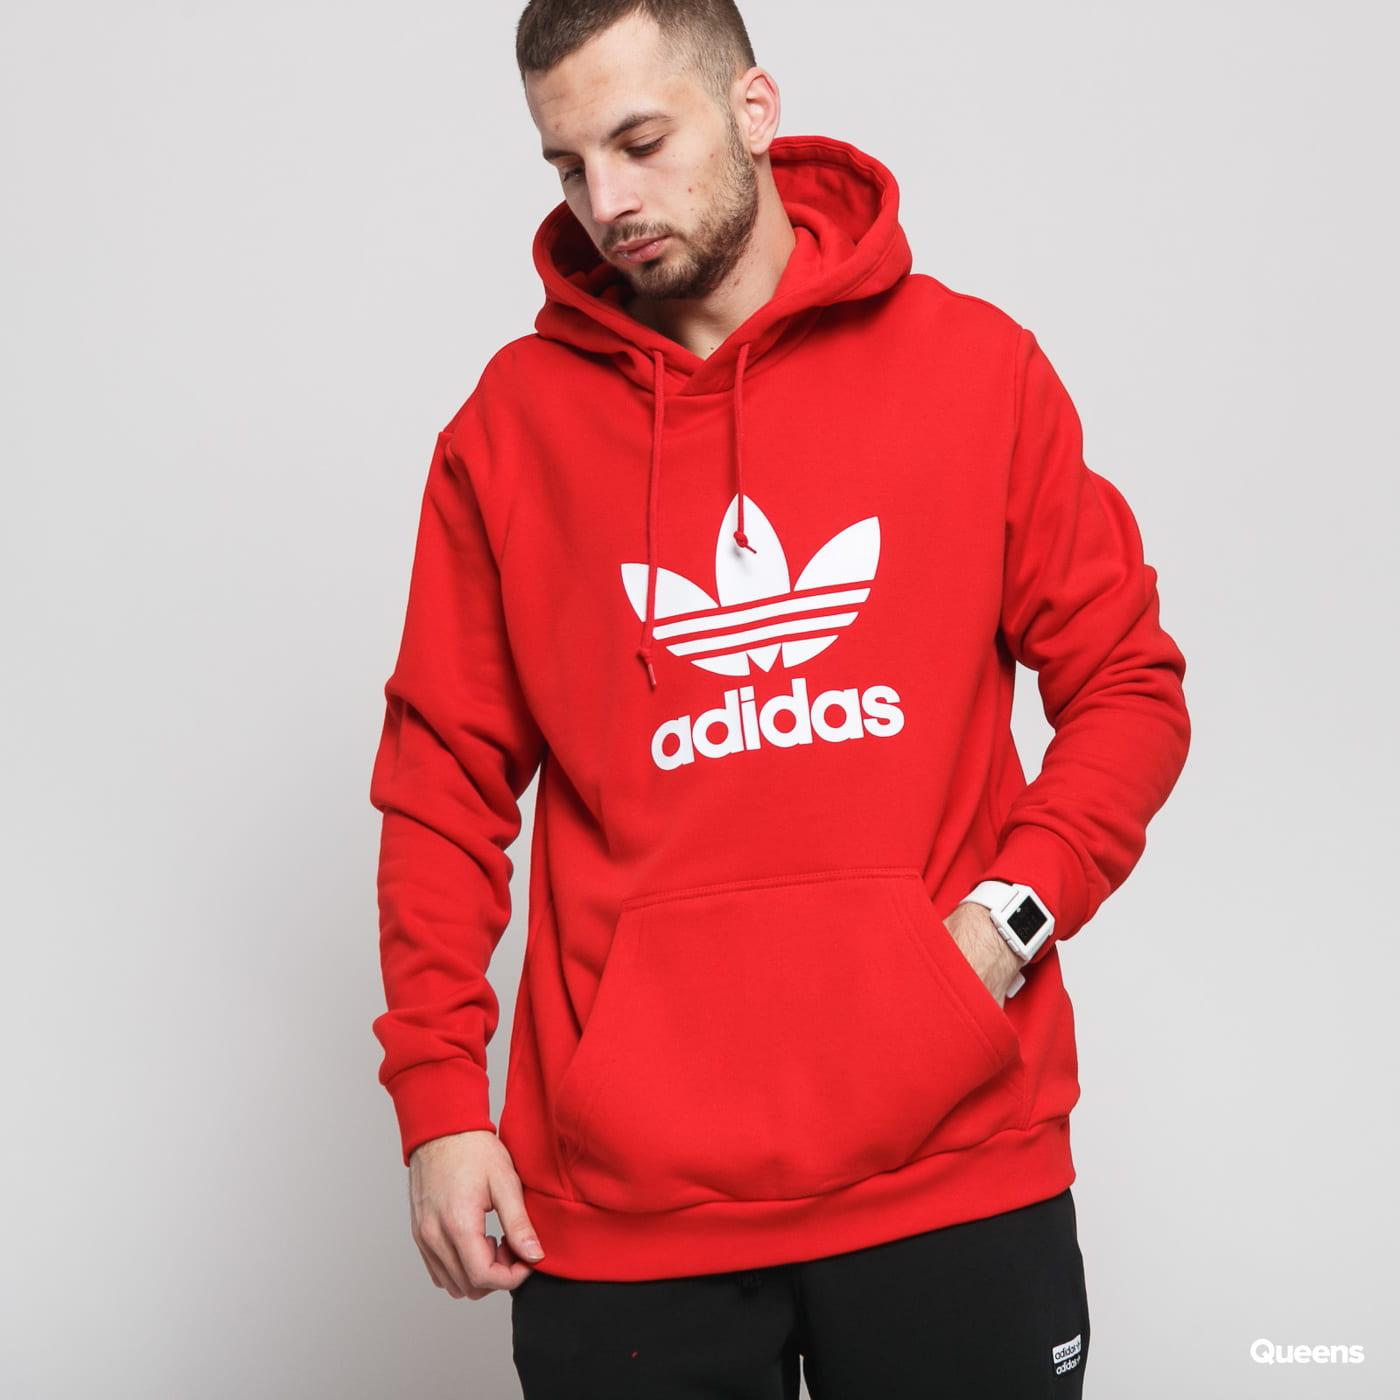 adidas v day trefoil hoodie